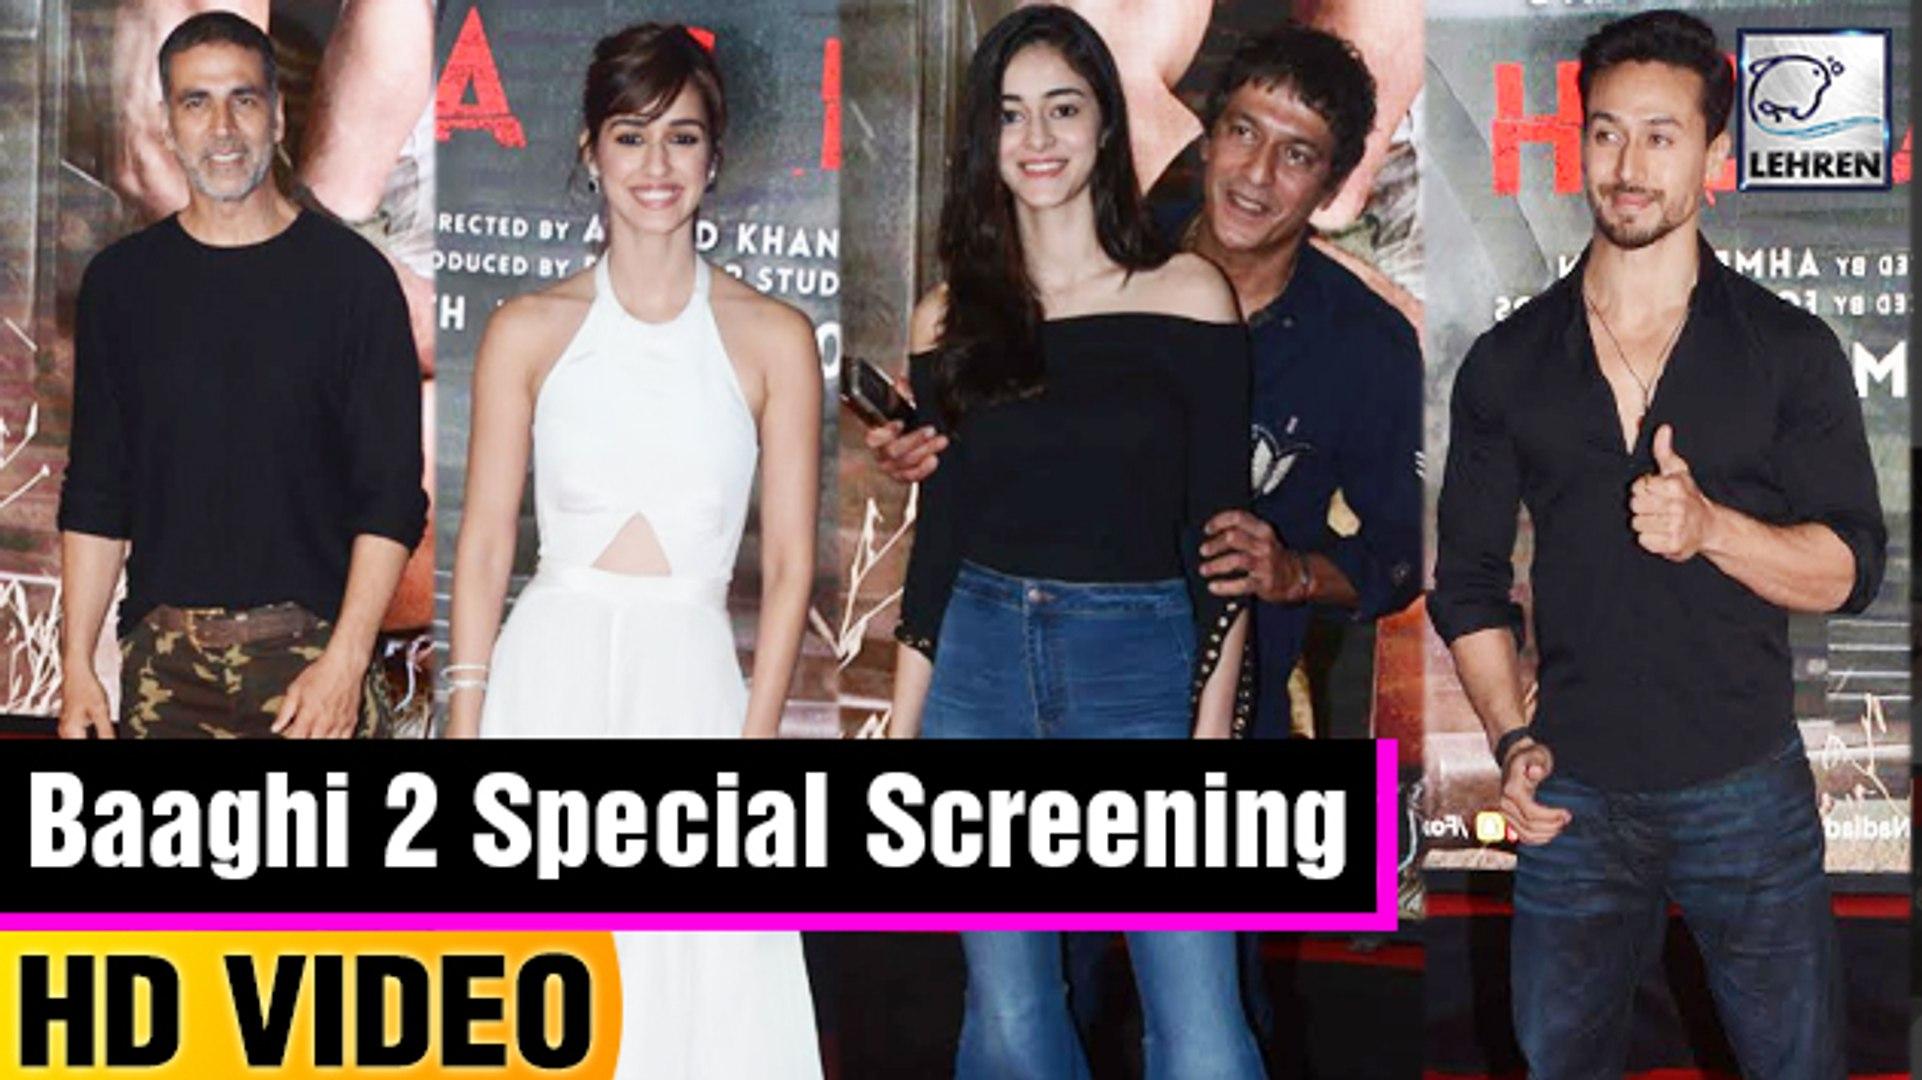 Special Screening Of Baaghi 2 | Tiger Shroff | Disha Patani